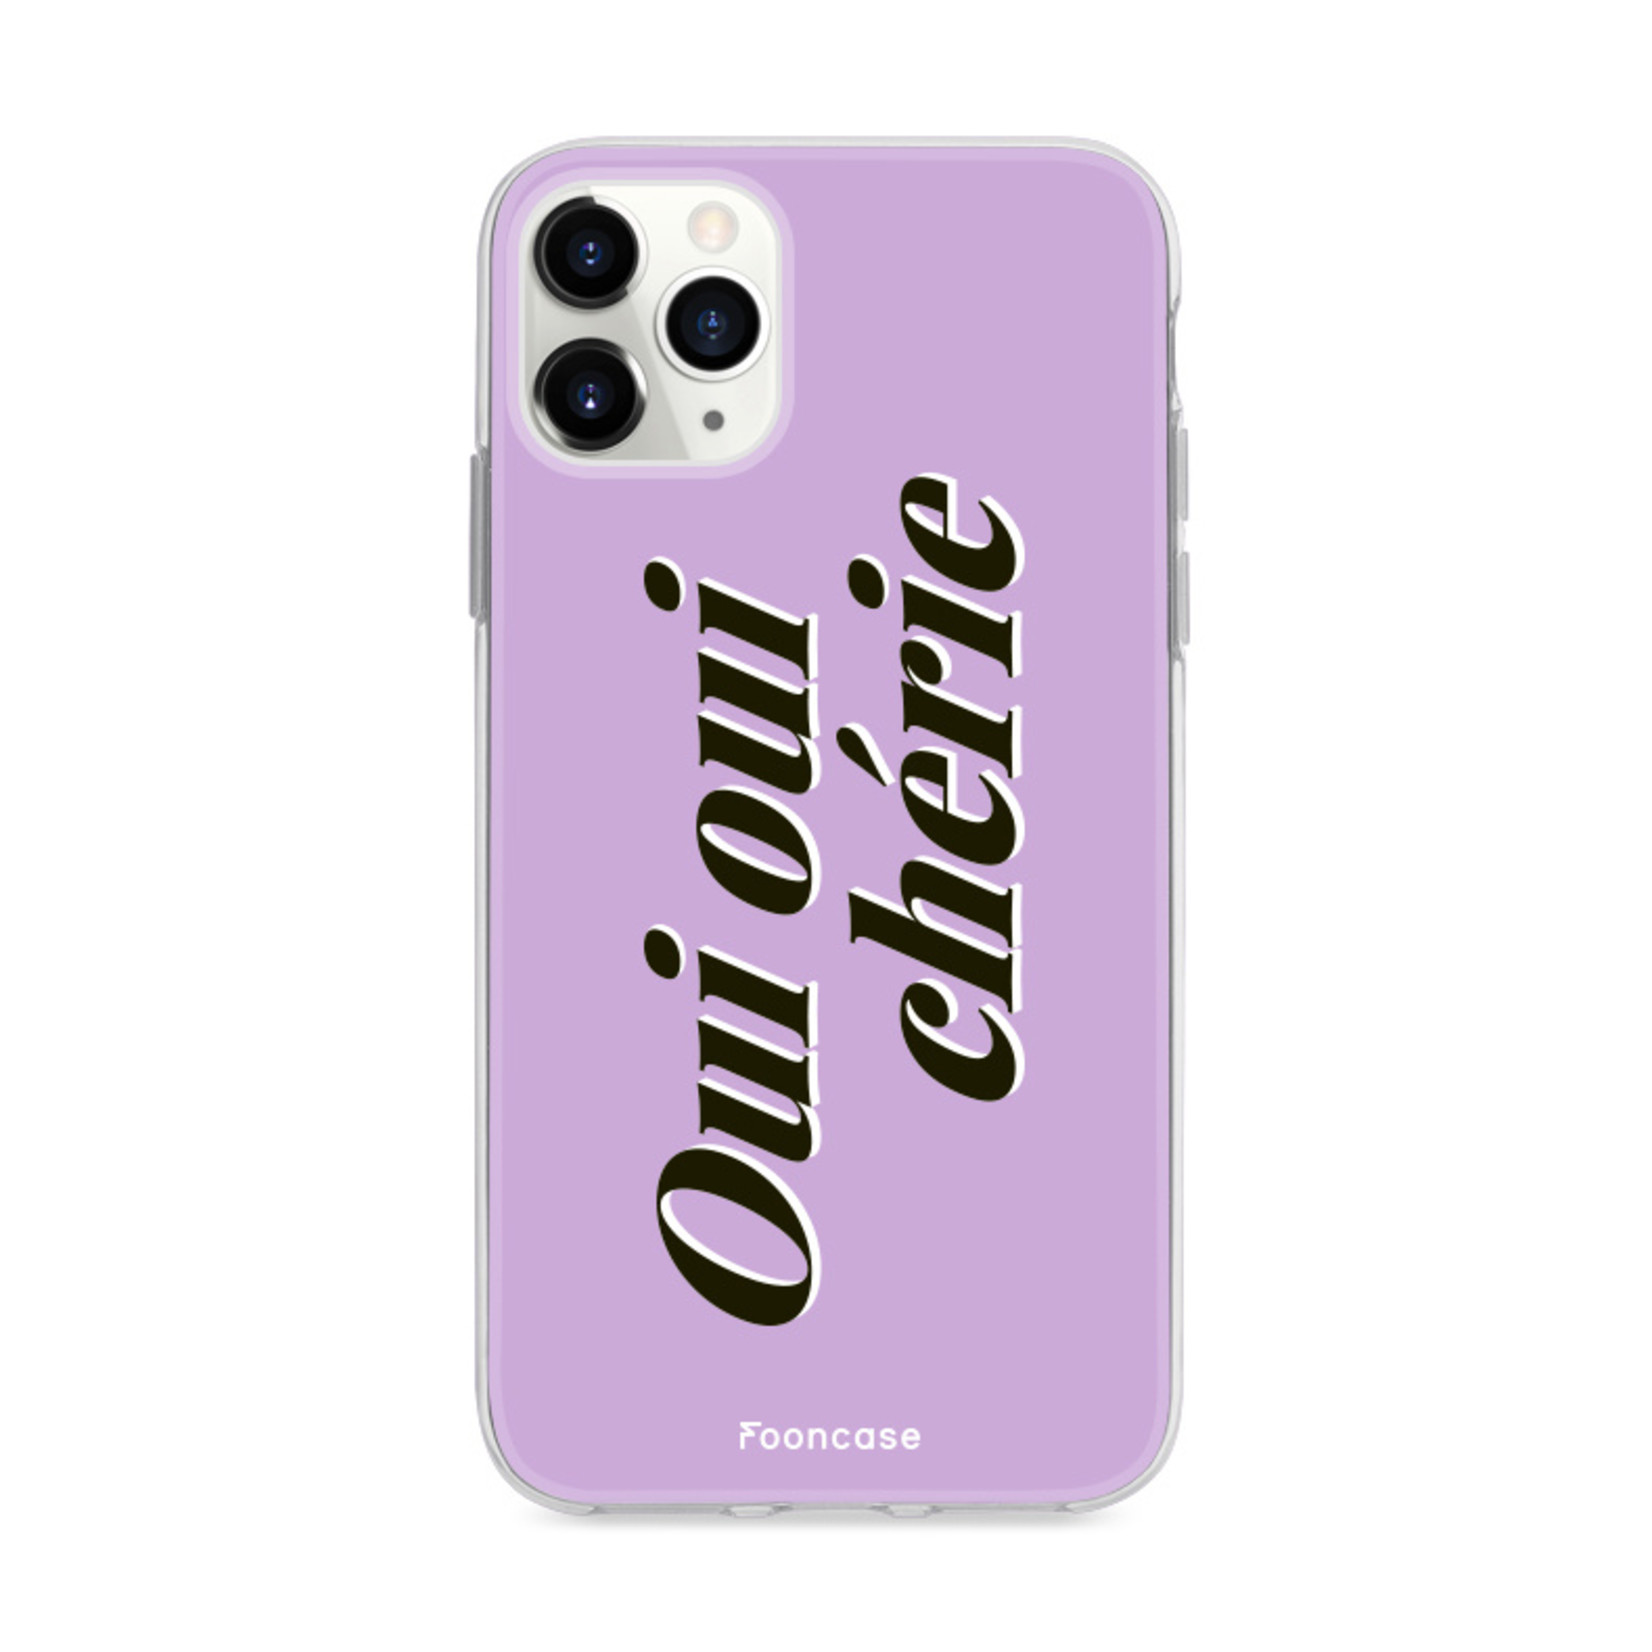 FOONCASE iPhone 11 Pro hoesje TPU Soft Case - Back Cover - Oui Oui Chérie / Lila Paars & Wit